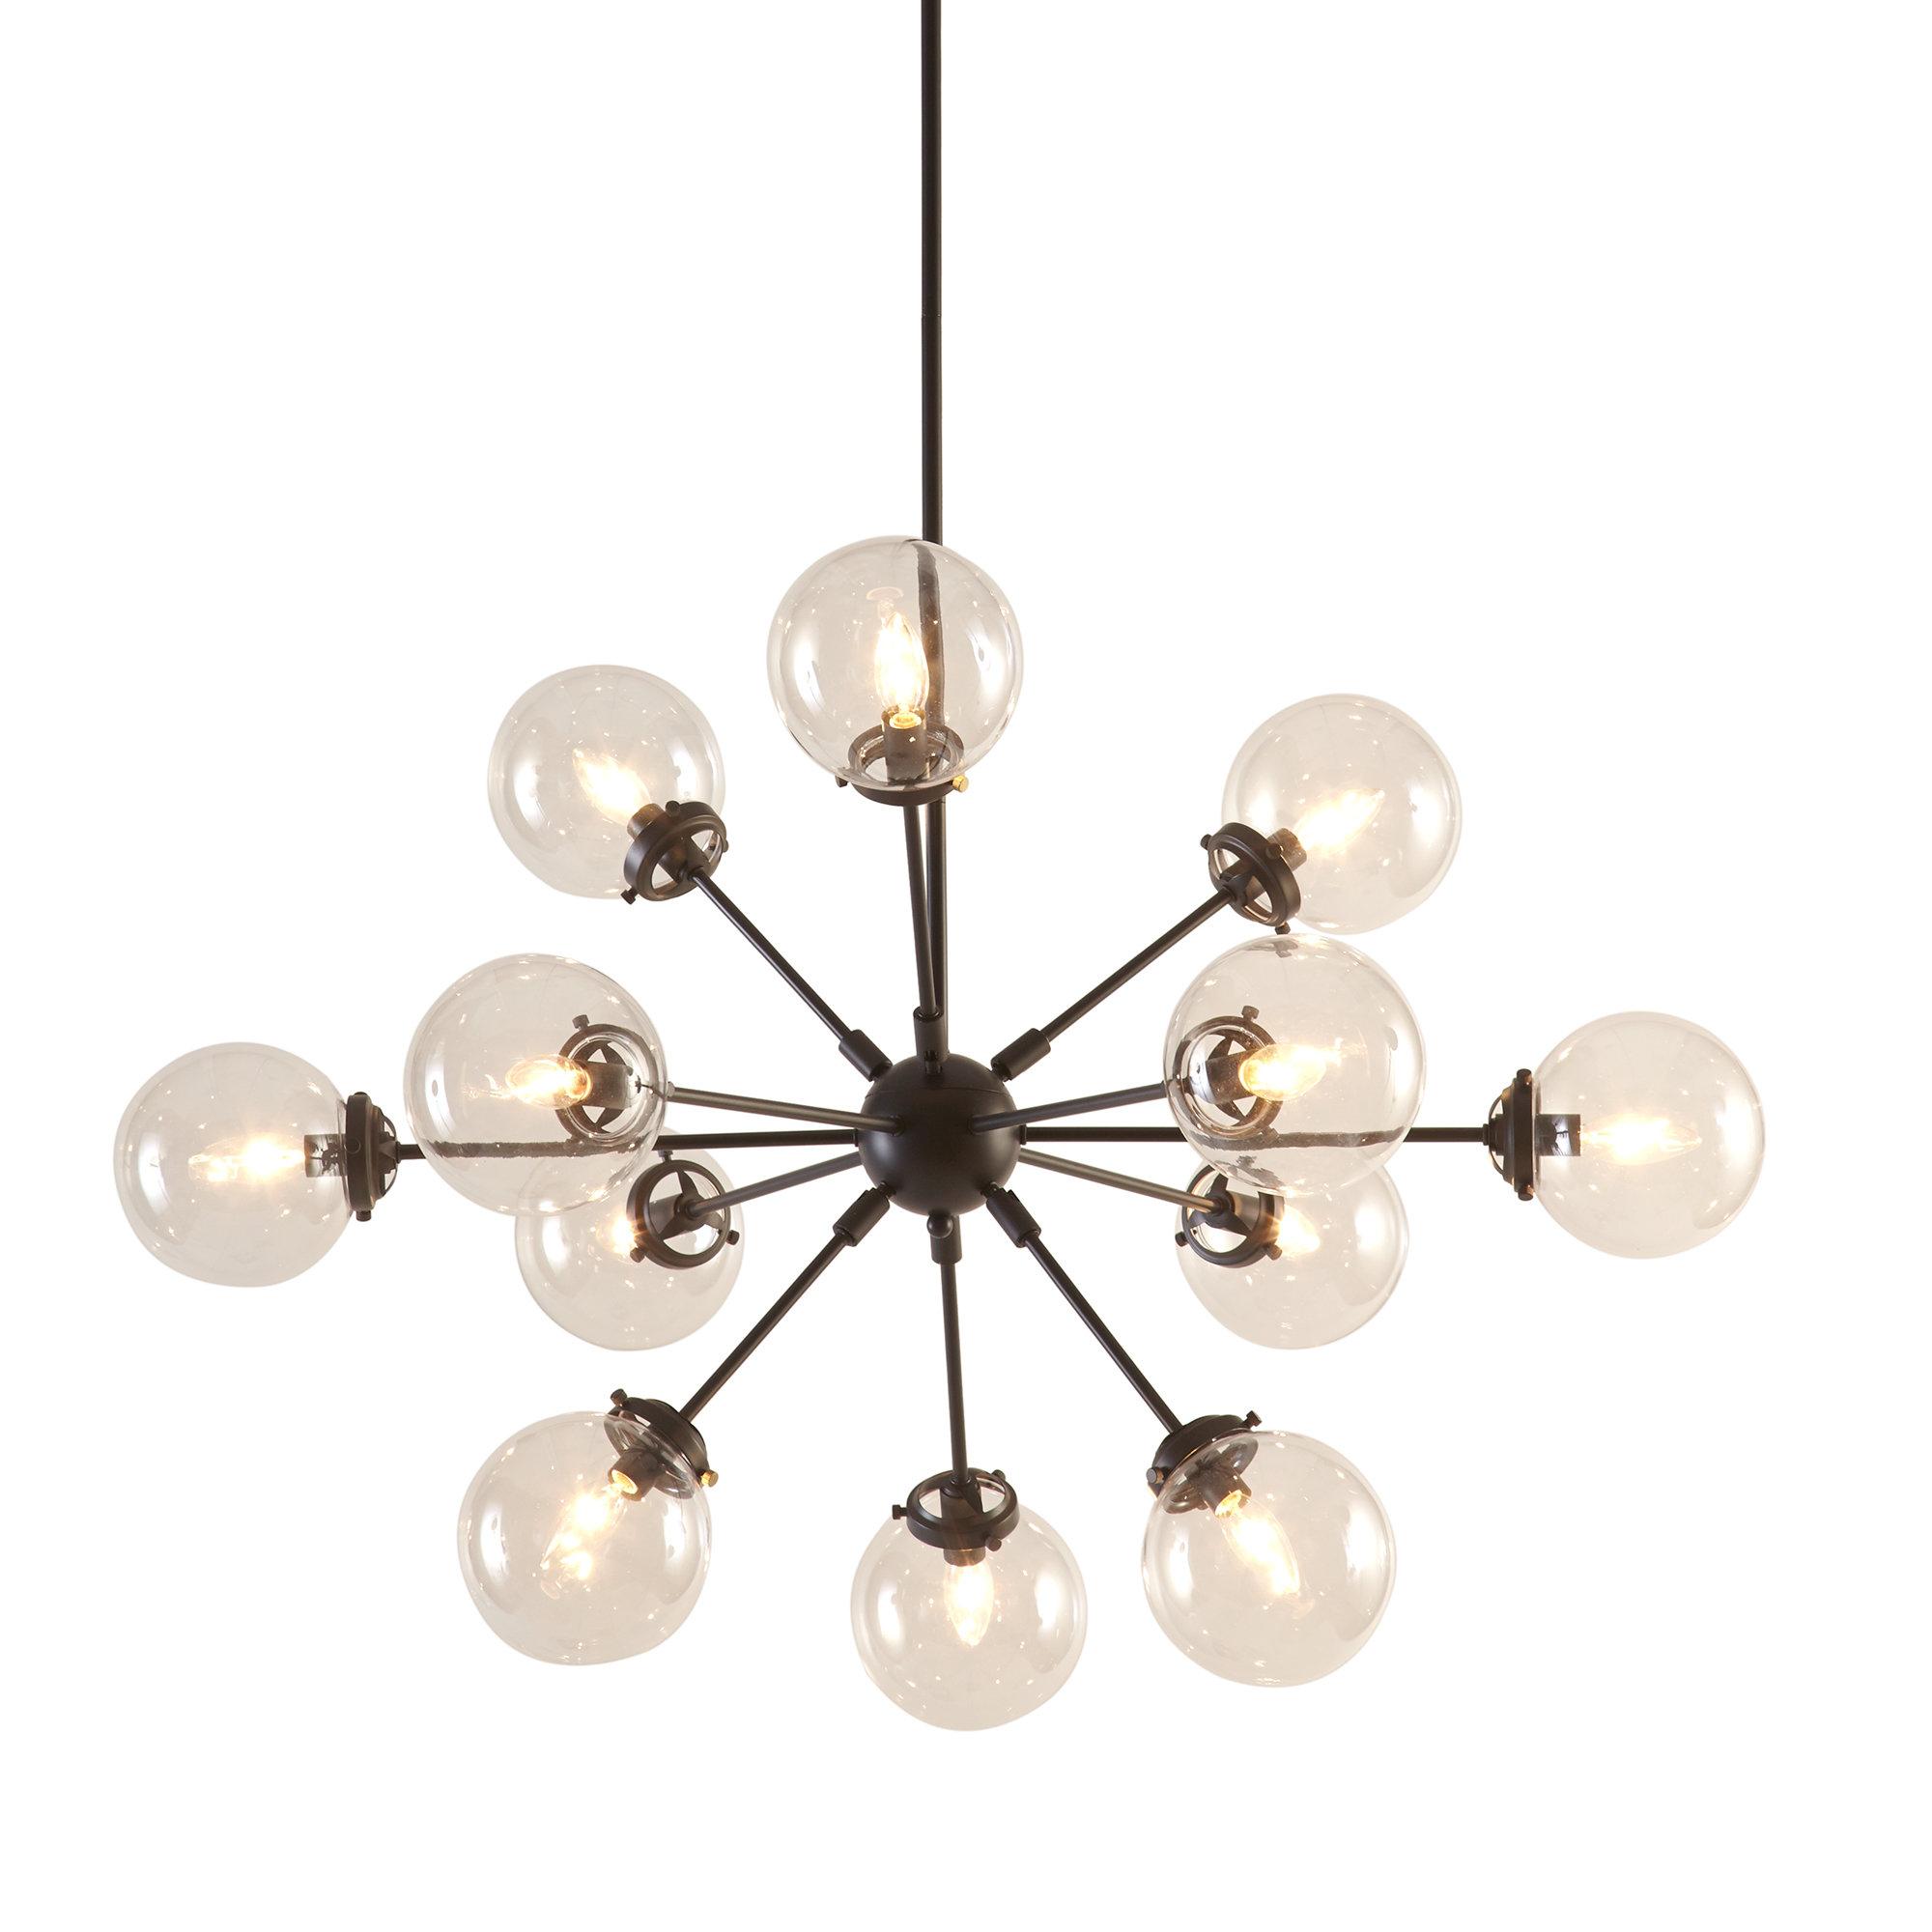 Popular Langley Street Benites 12 Light Sputnik Chandelier Regarding Bacchus 12 Light Sputnik Chandeliers (View 14 of 20)